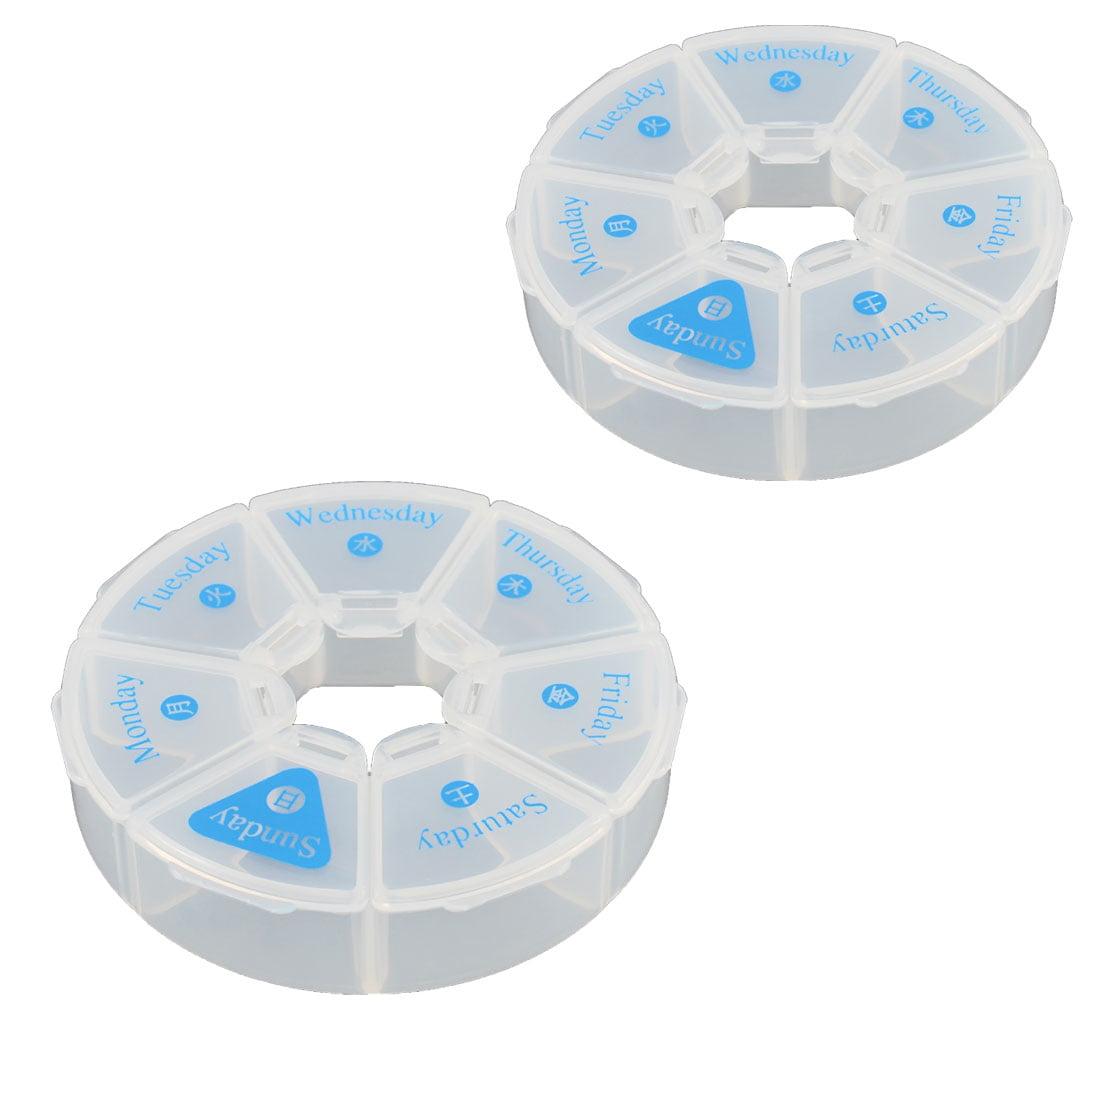 Outdoor Travel Plastic Round Design 7 Compartments  Box Organizer 2 PCS